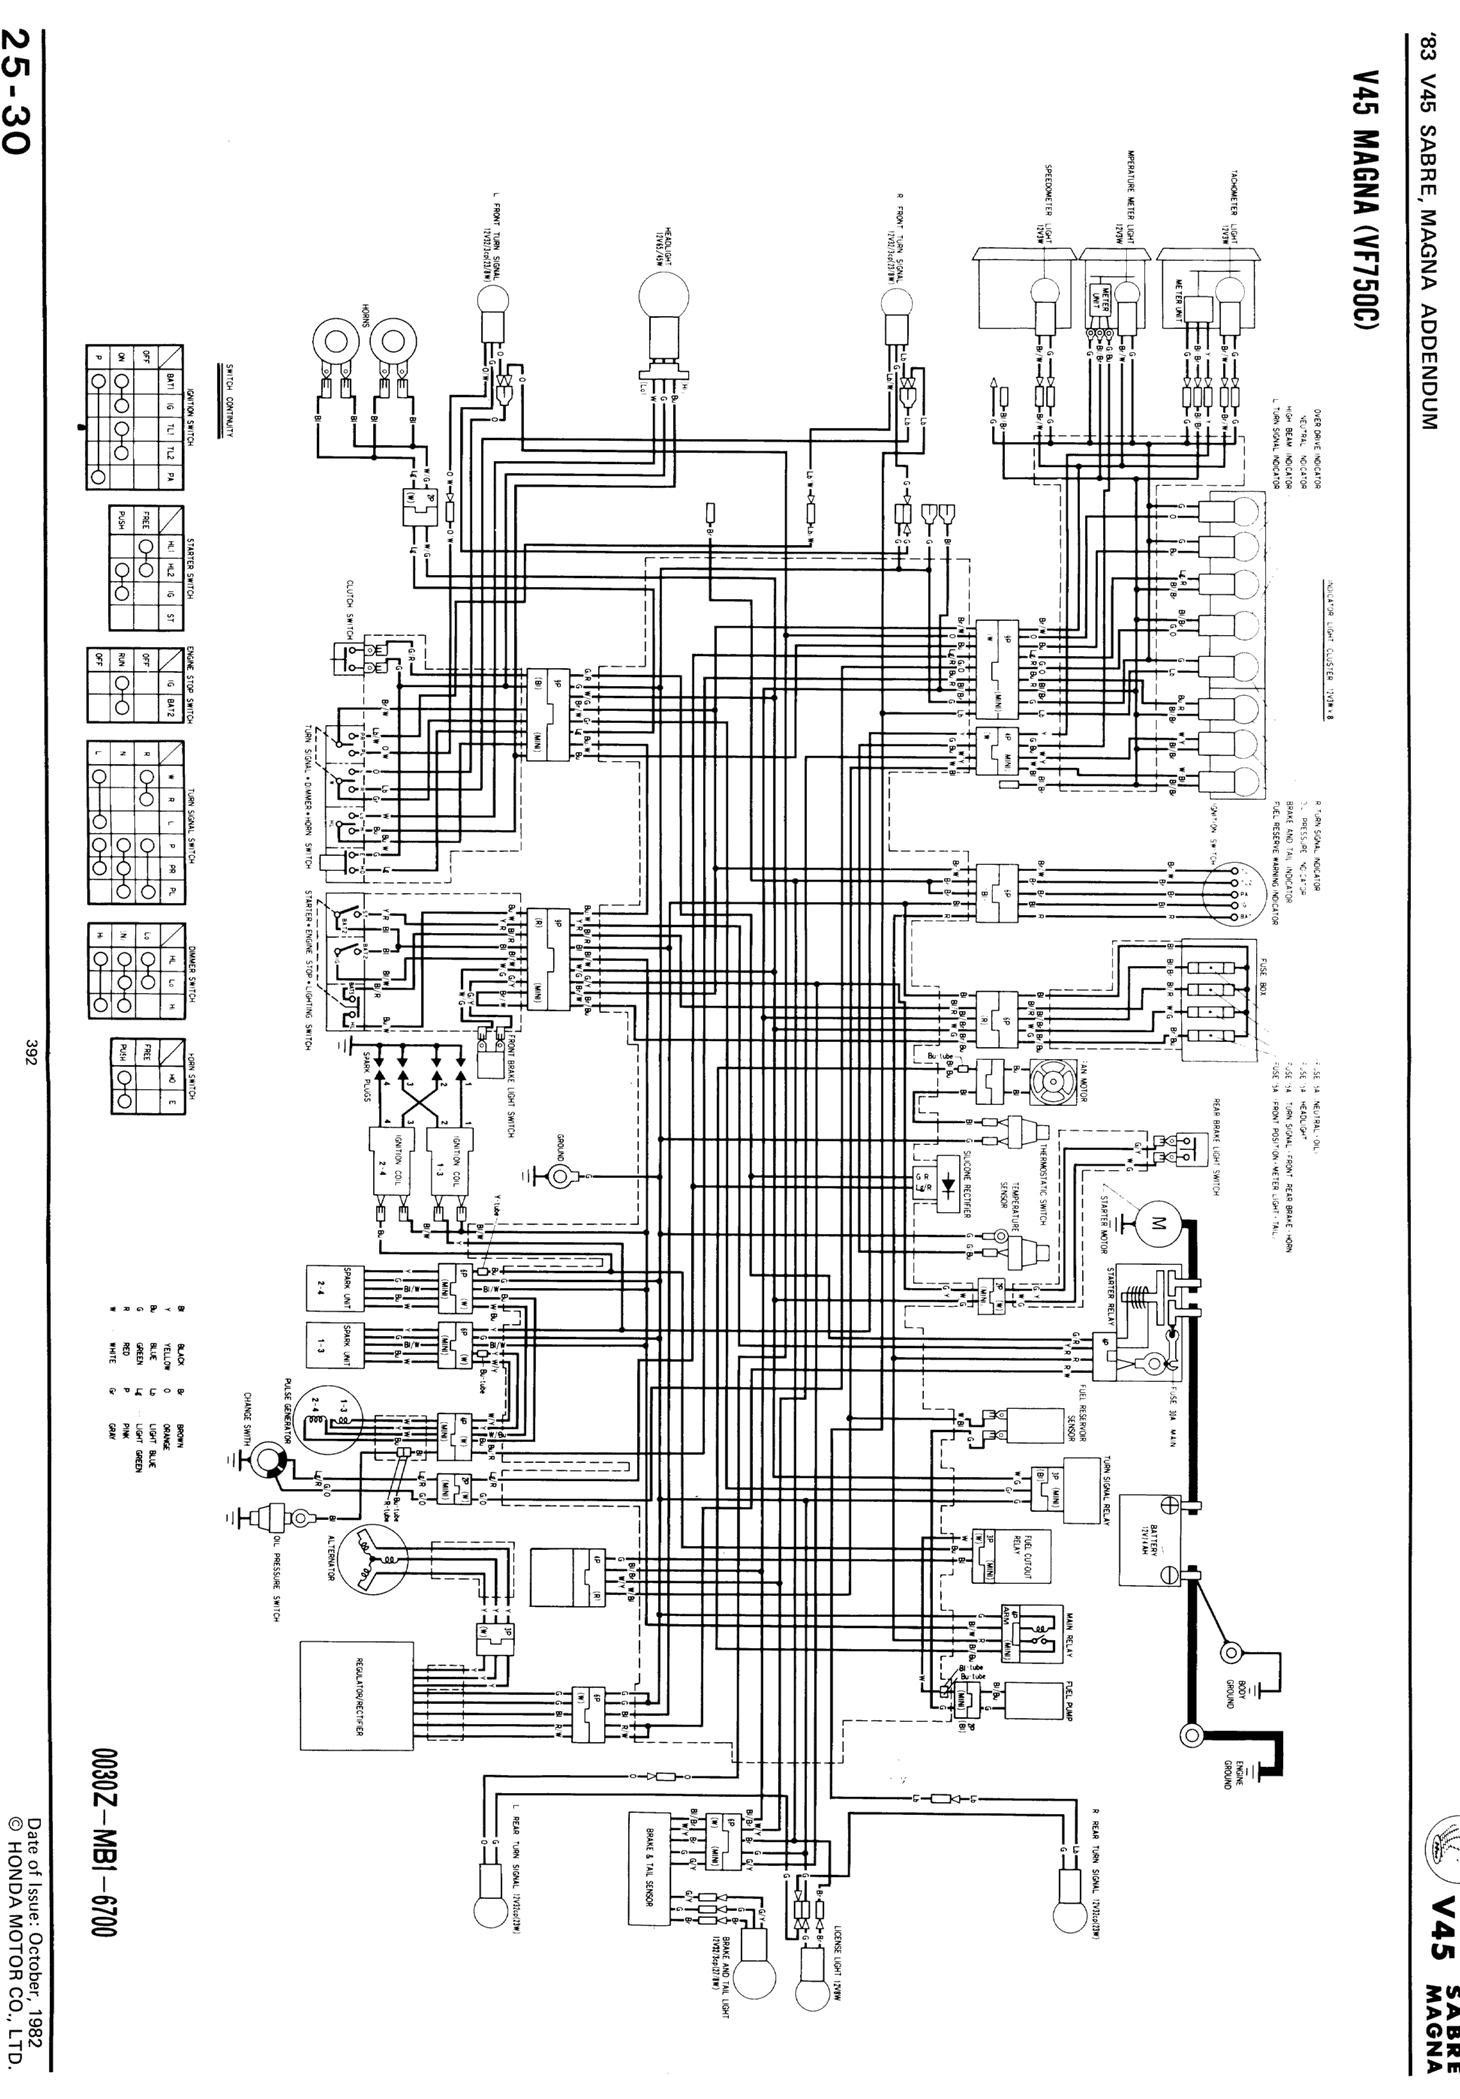 Diagram Honda Goldwing 1200 Wiring Diagram Full Version Hd Quality Wiring Diagram The33is Gsdportotorres It